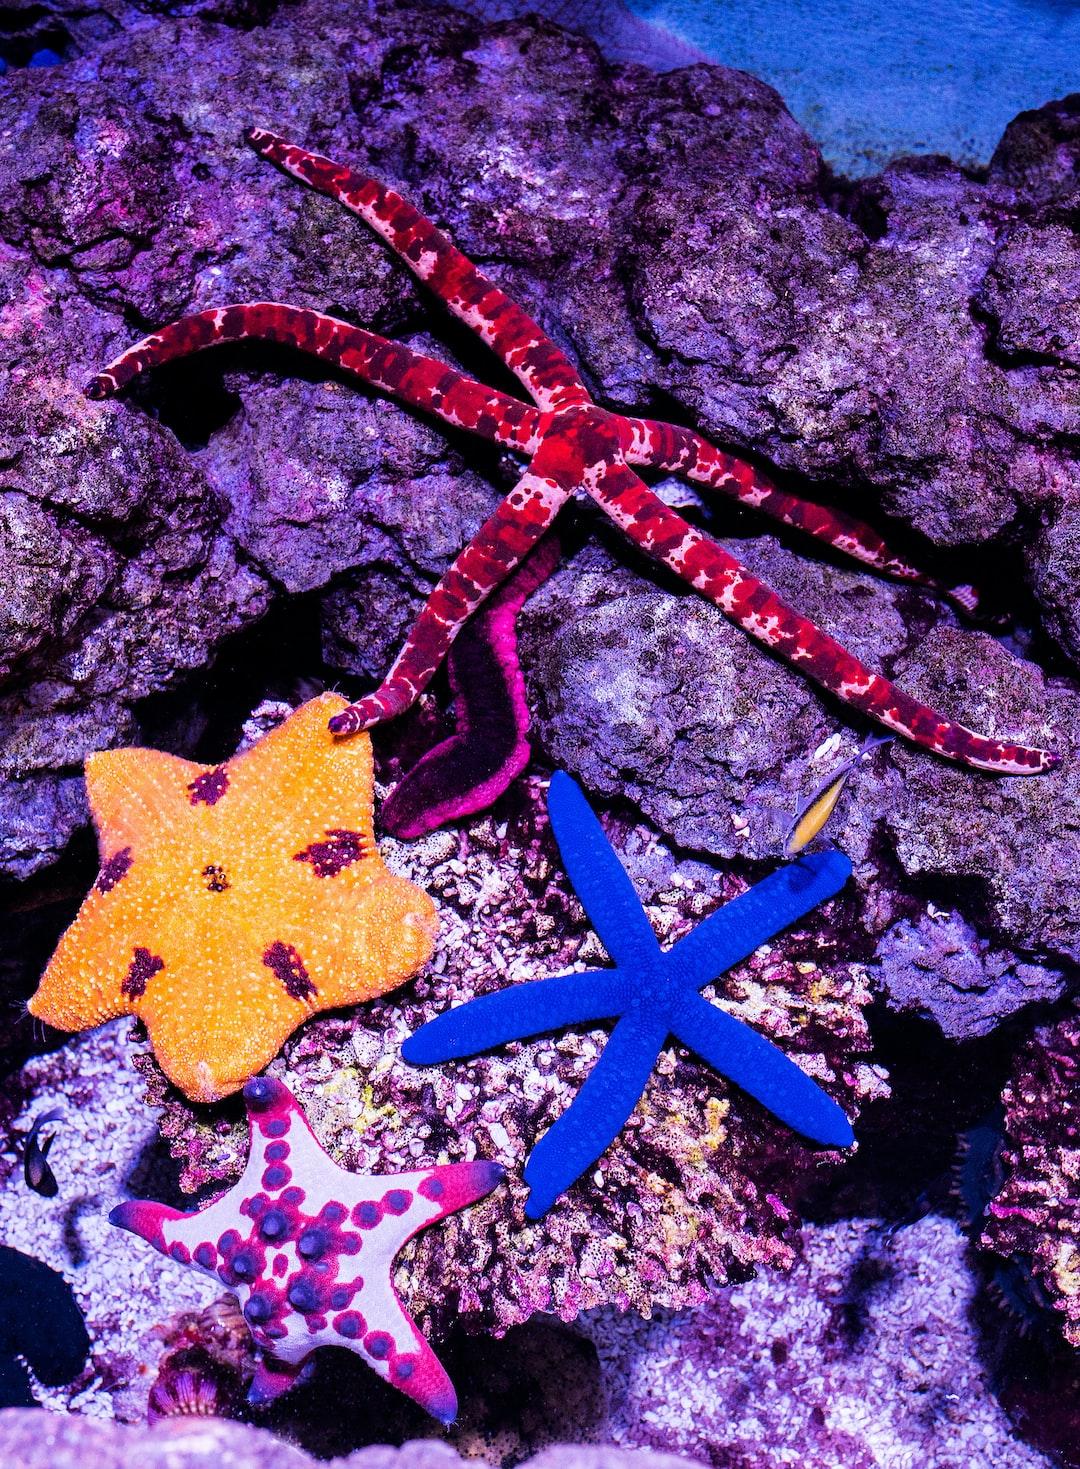 Four different starfish species in the touch tank at the Cairns aquarium. Top: Rose-blotch Seastar, Left: Elegant Seastar. Right: Blue Linckia Seastar. Bottom: Chocolate Chip Seastar.